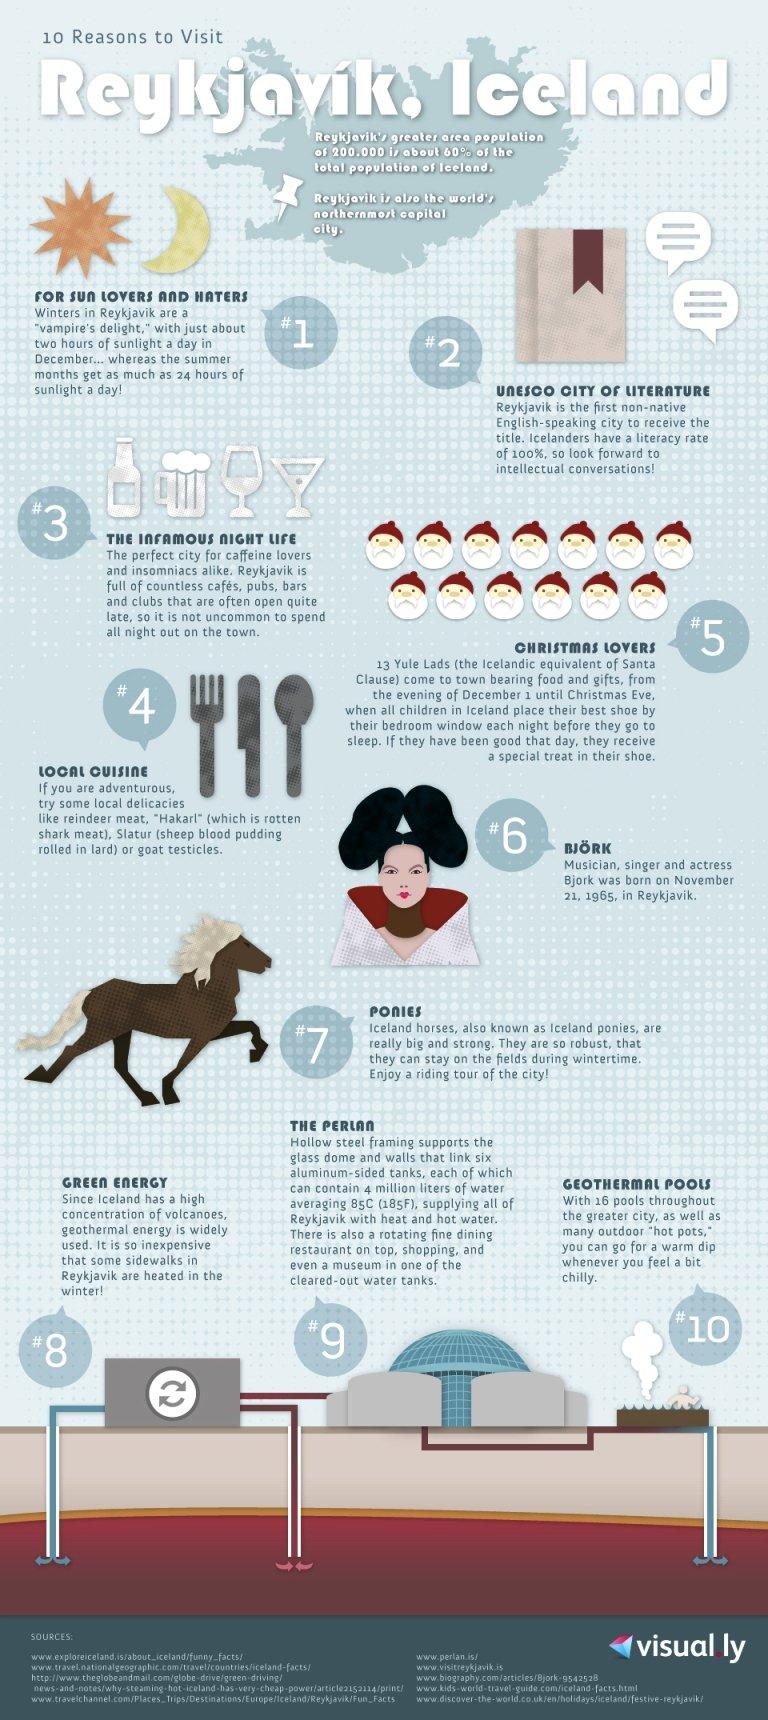 10 reasons to visit reykjavik Iceland #infographic